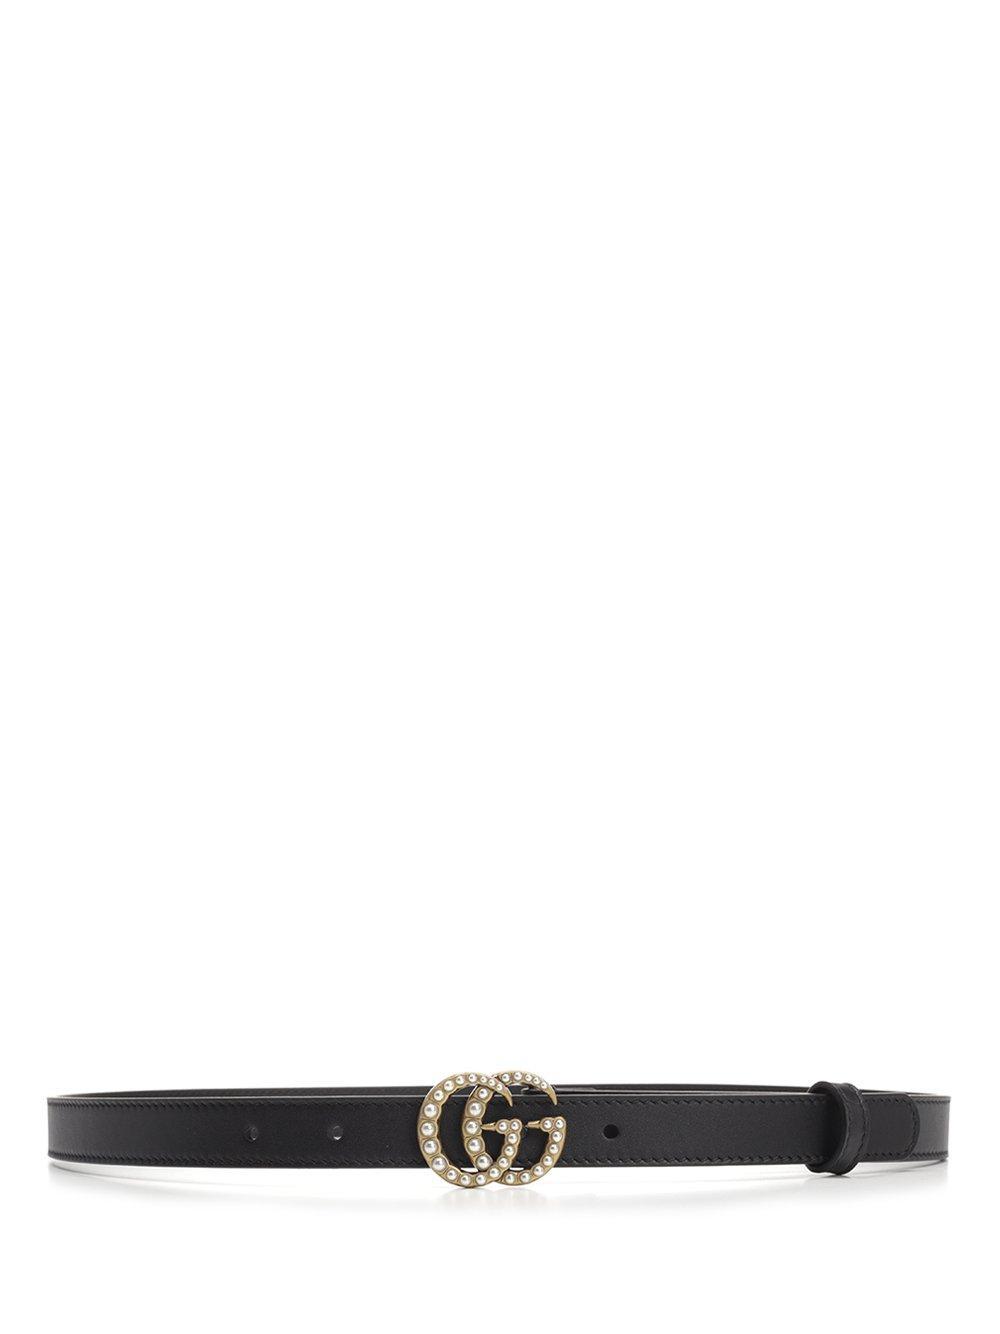 b40592c839fe Lyst - Gucci GG Marmont Belt in Black